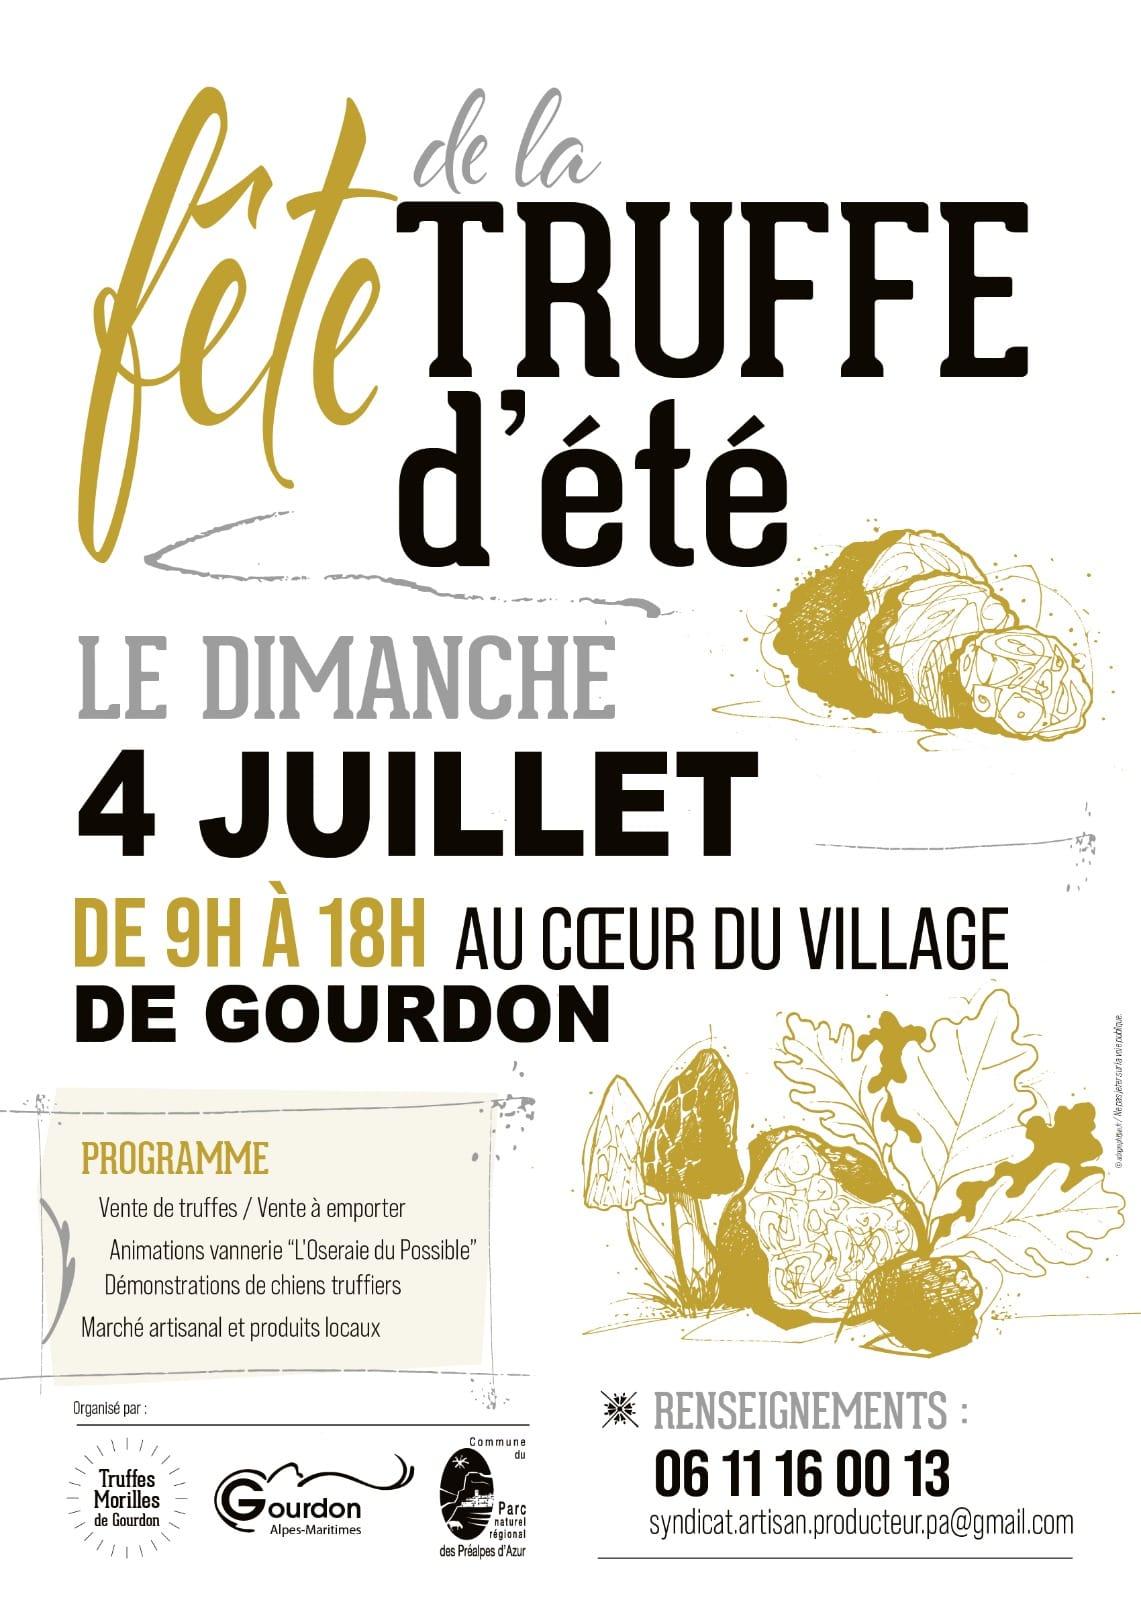 fete truffe ete gourdon animation marche agenda evenements 06